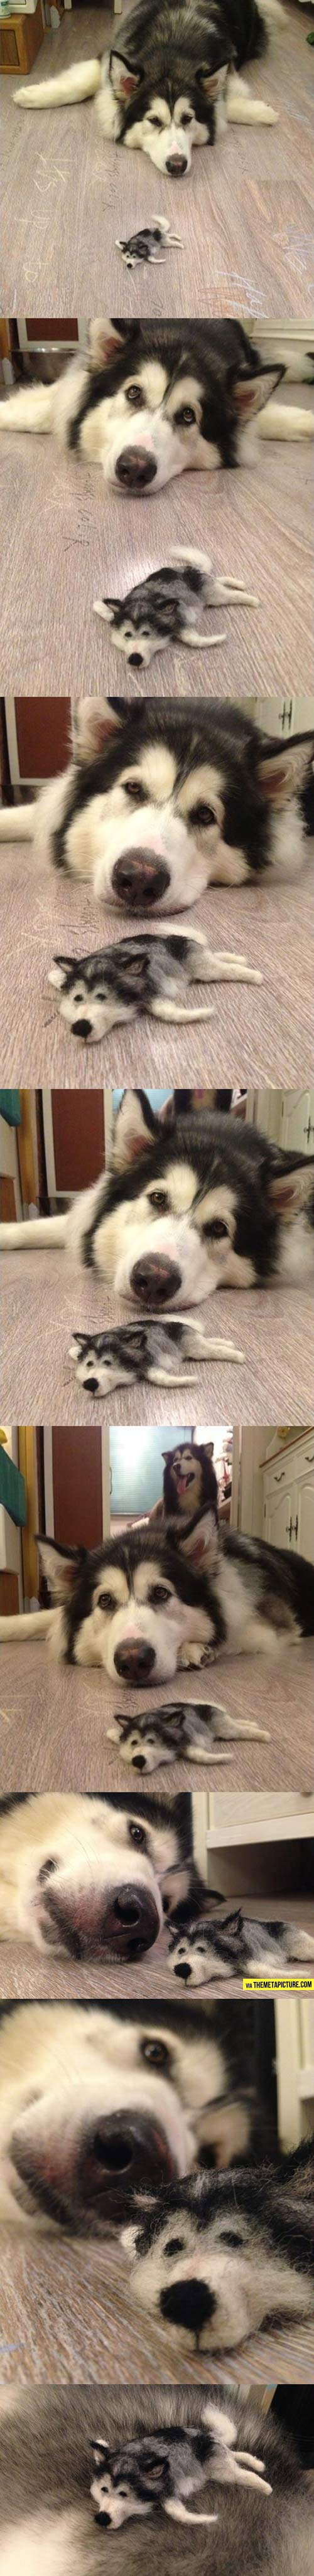 funny-lazy-dog-fur-toy